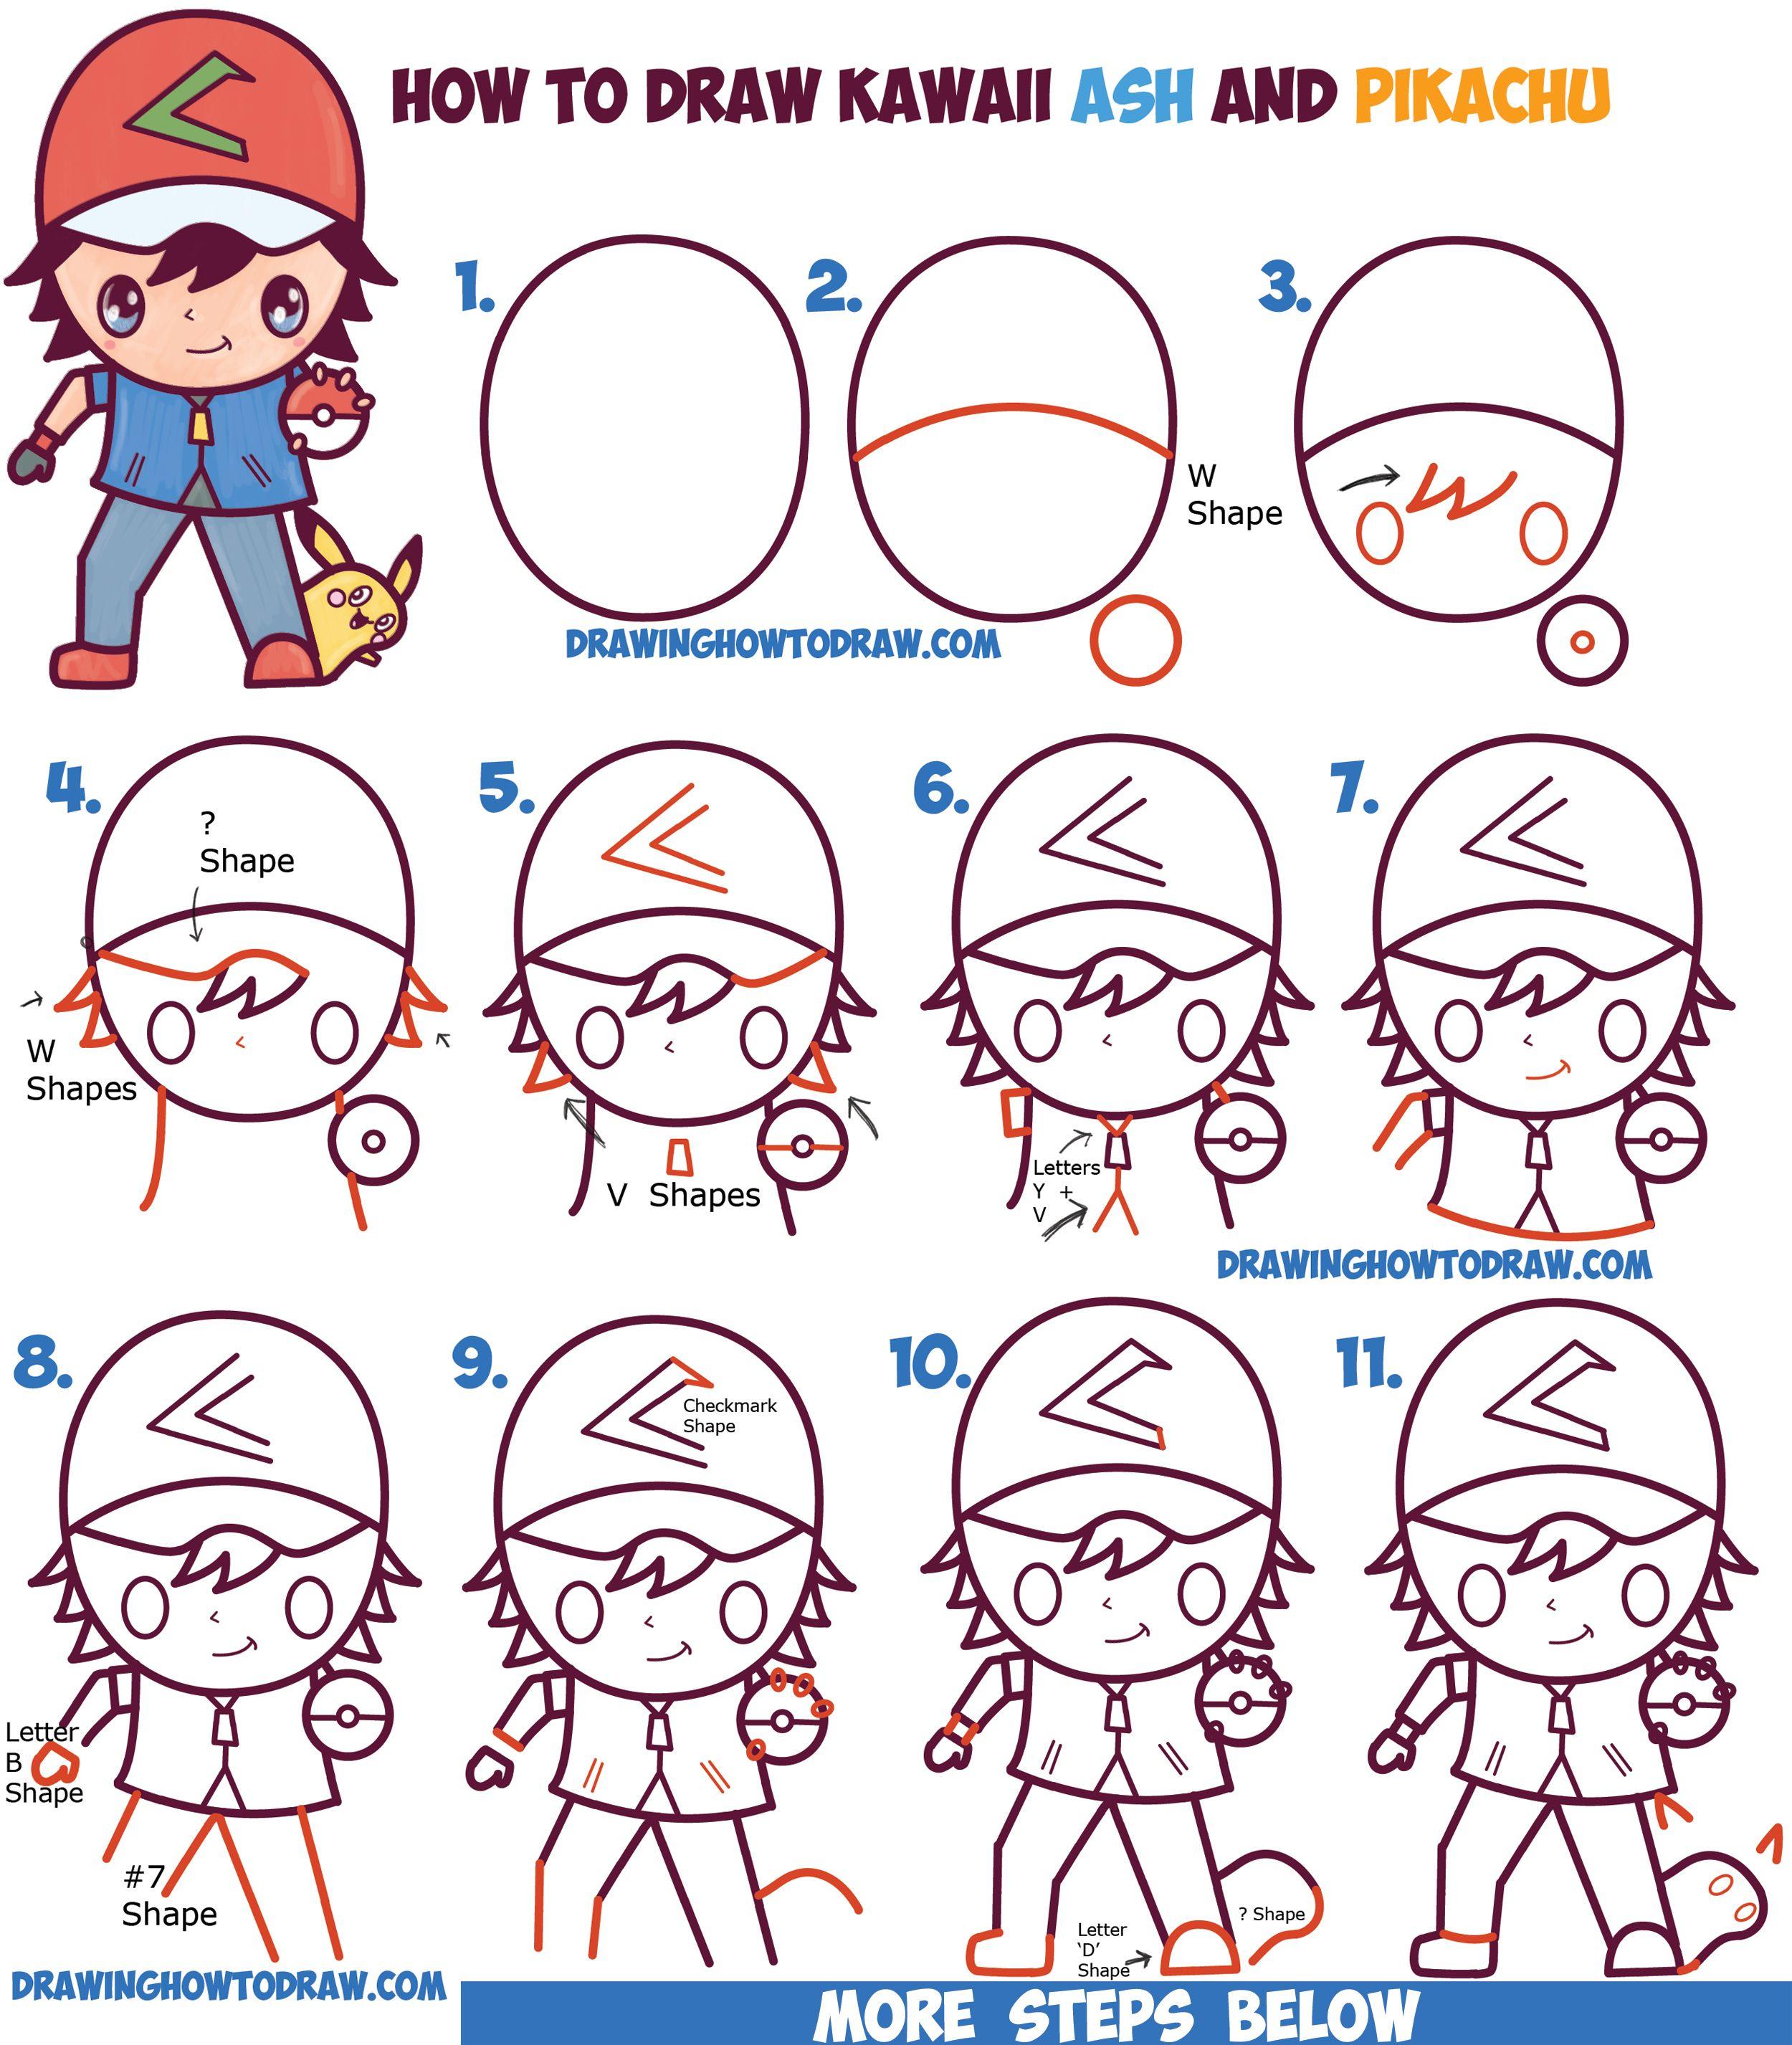 How To Draw Cute Kawaii Chibi Ash Ketchum And Pikachu From Pokemon